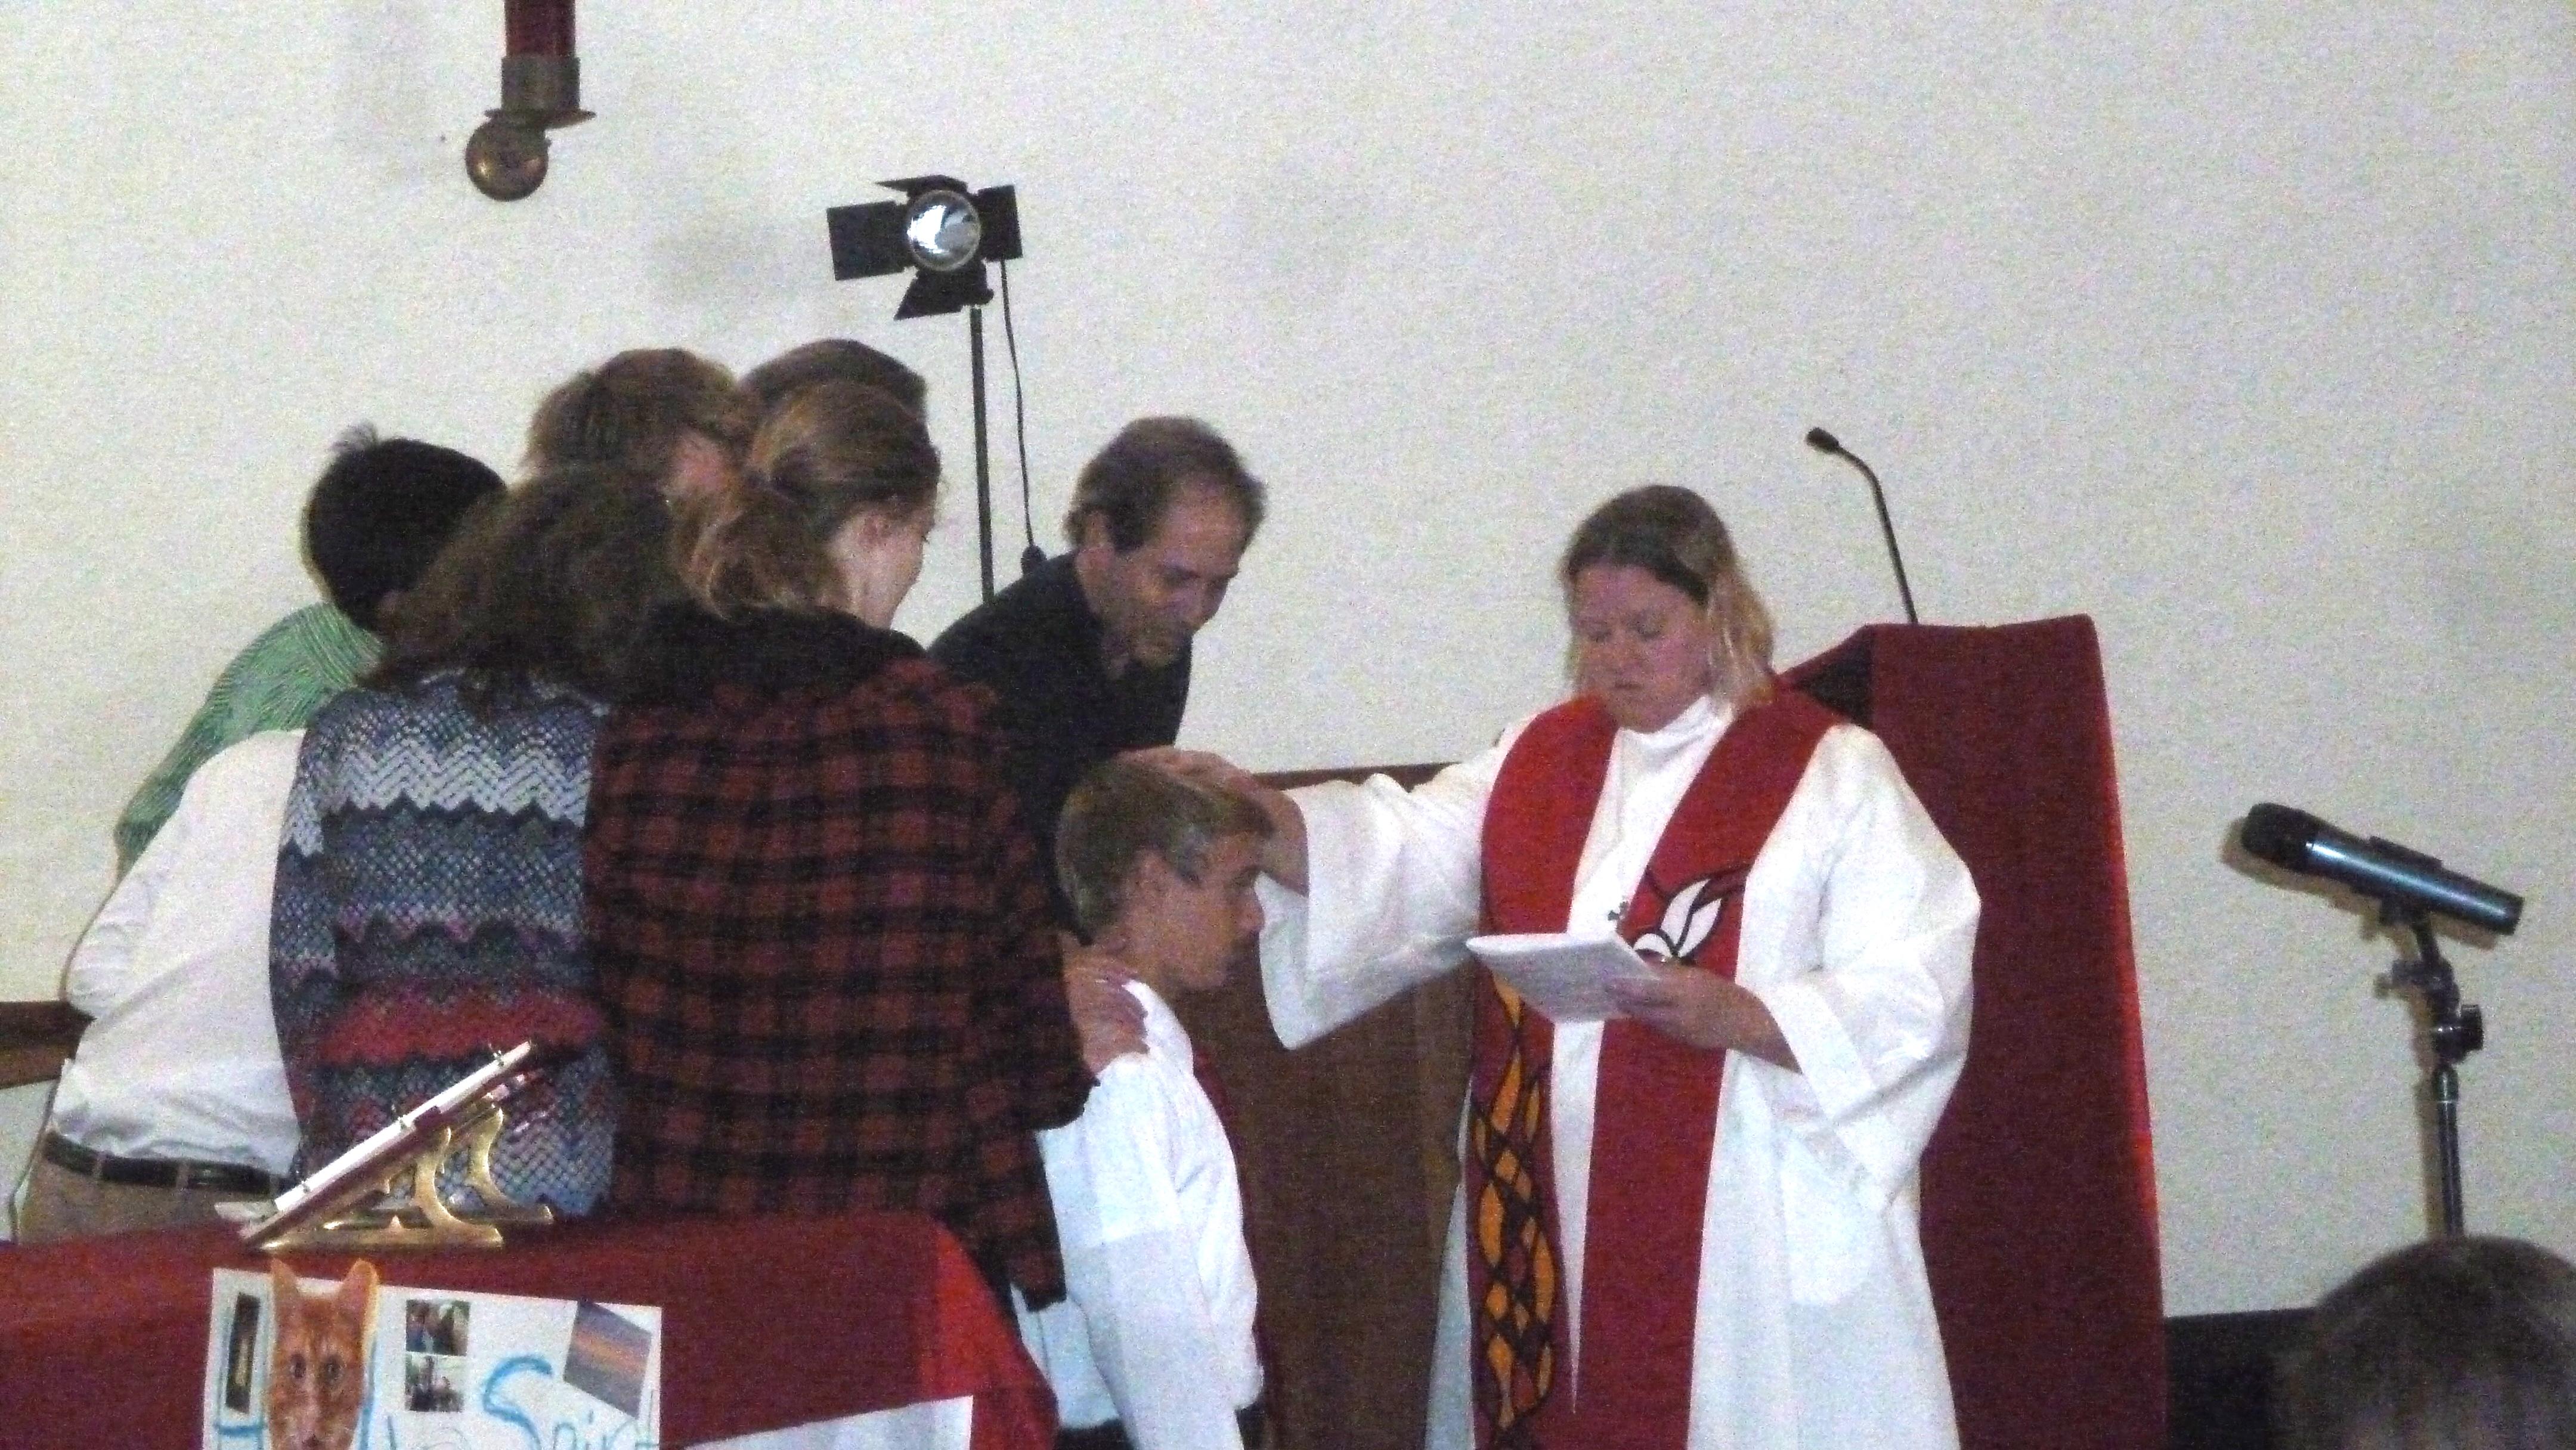 2015-05-24 Pentecost-Henry-Anderson-Confirmation 31.JPG